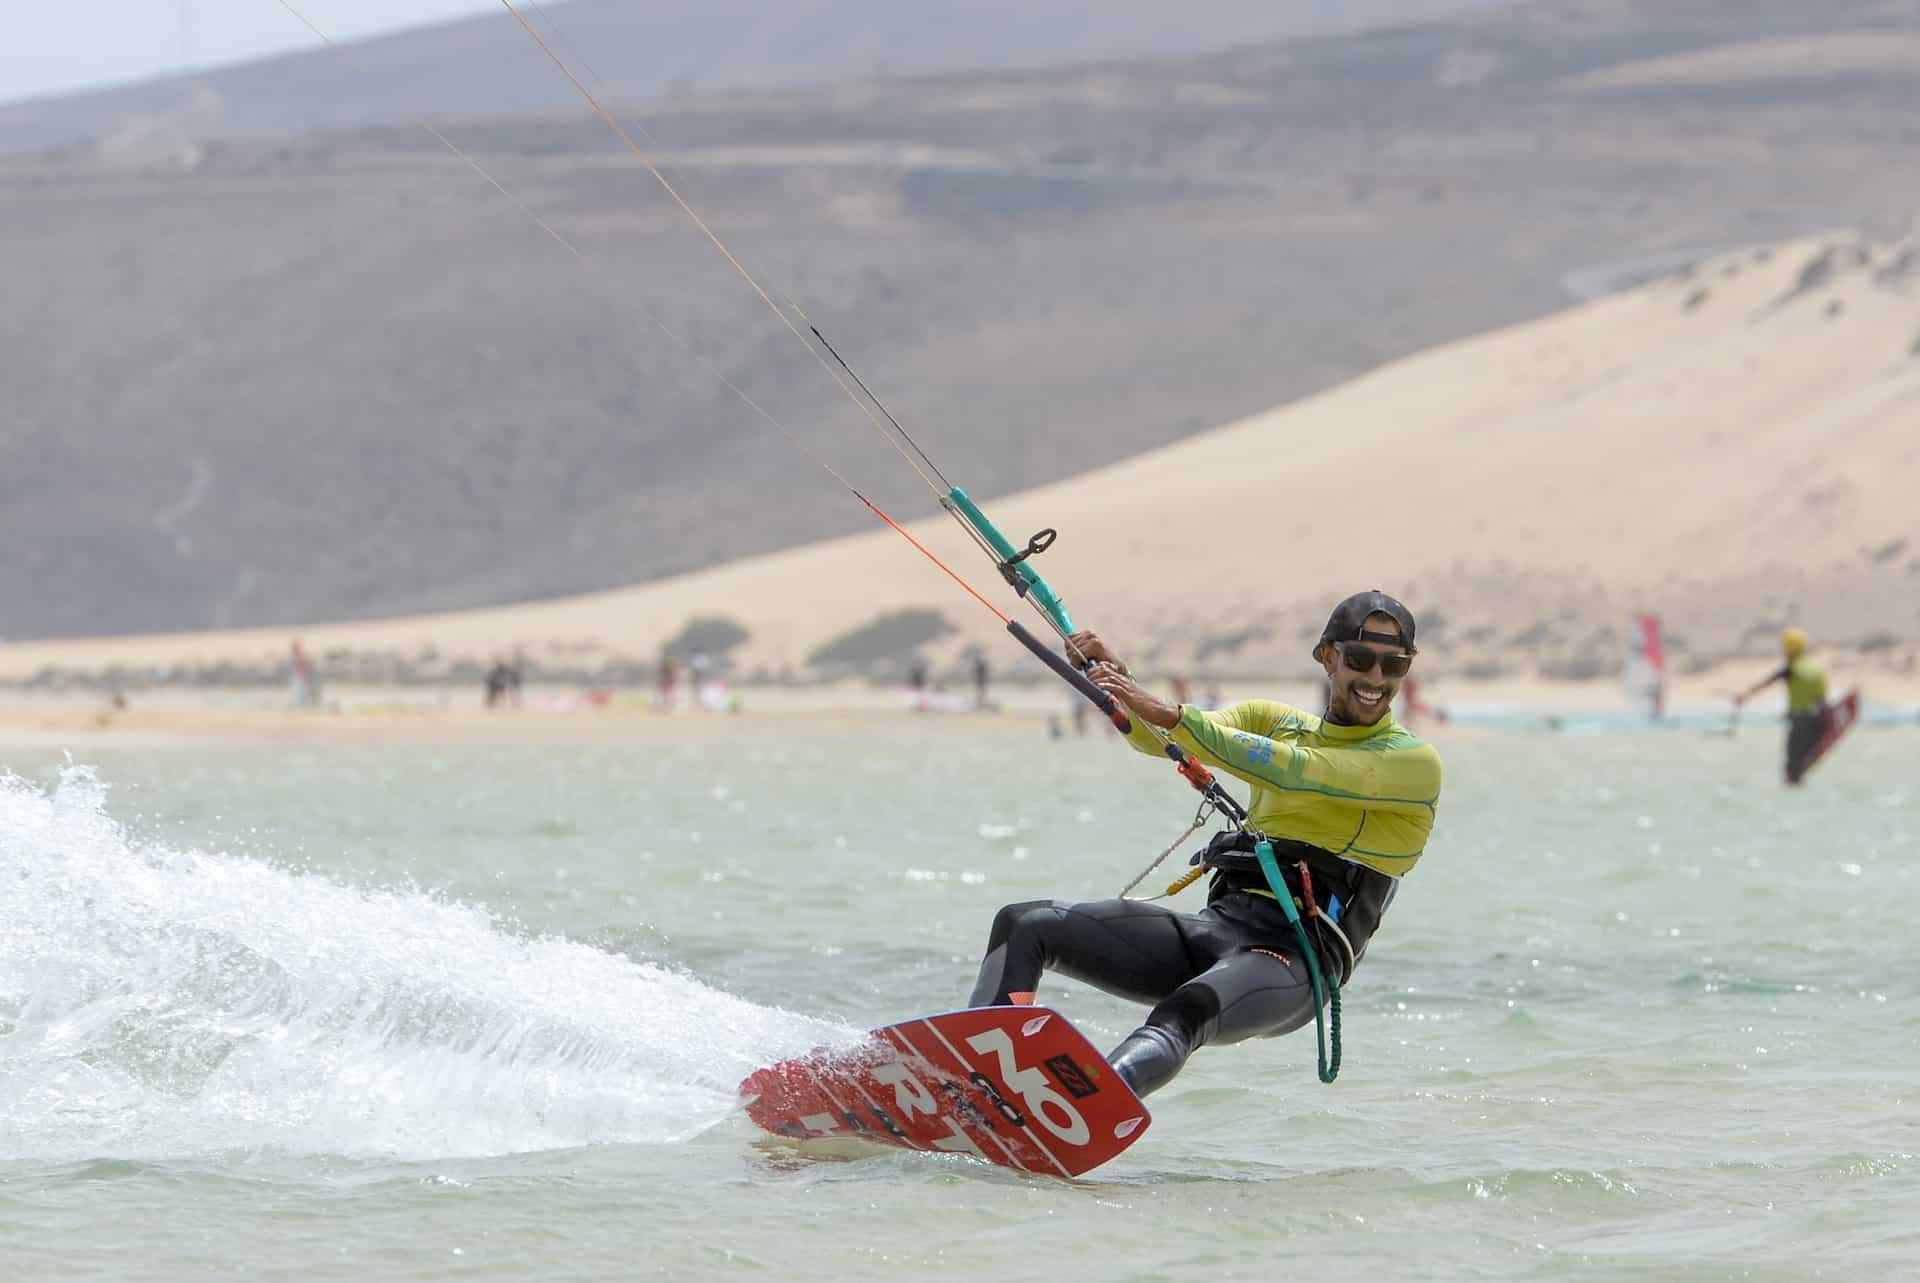 Kitesurf remonter au vent